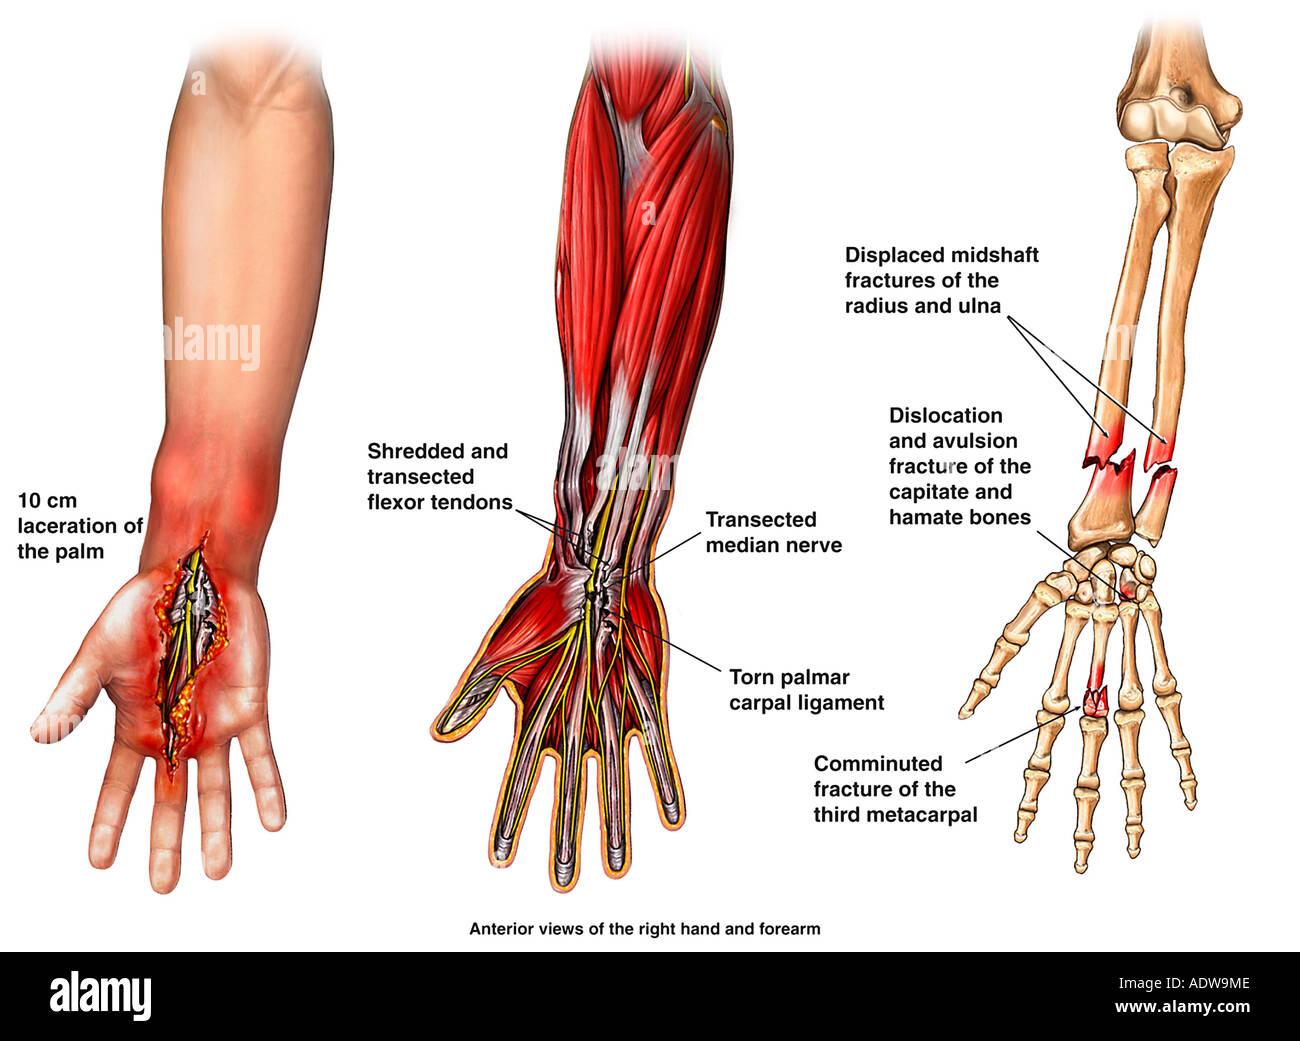 Tendon Anatomy Of The Hand 8933307 Es Youlandfo